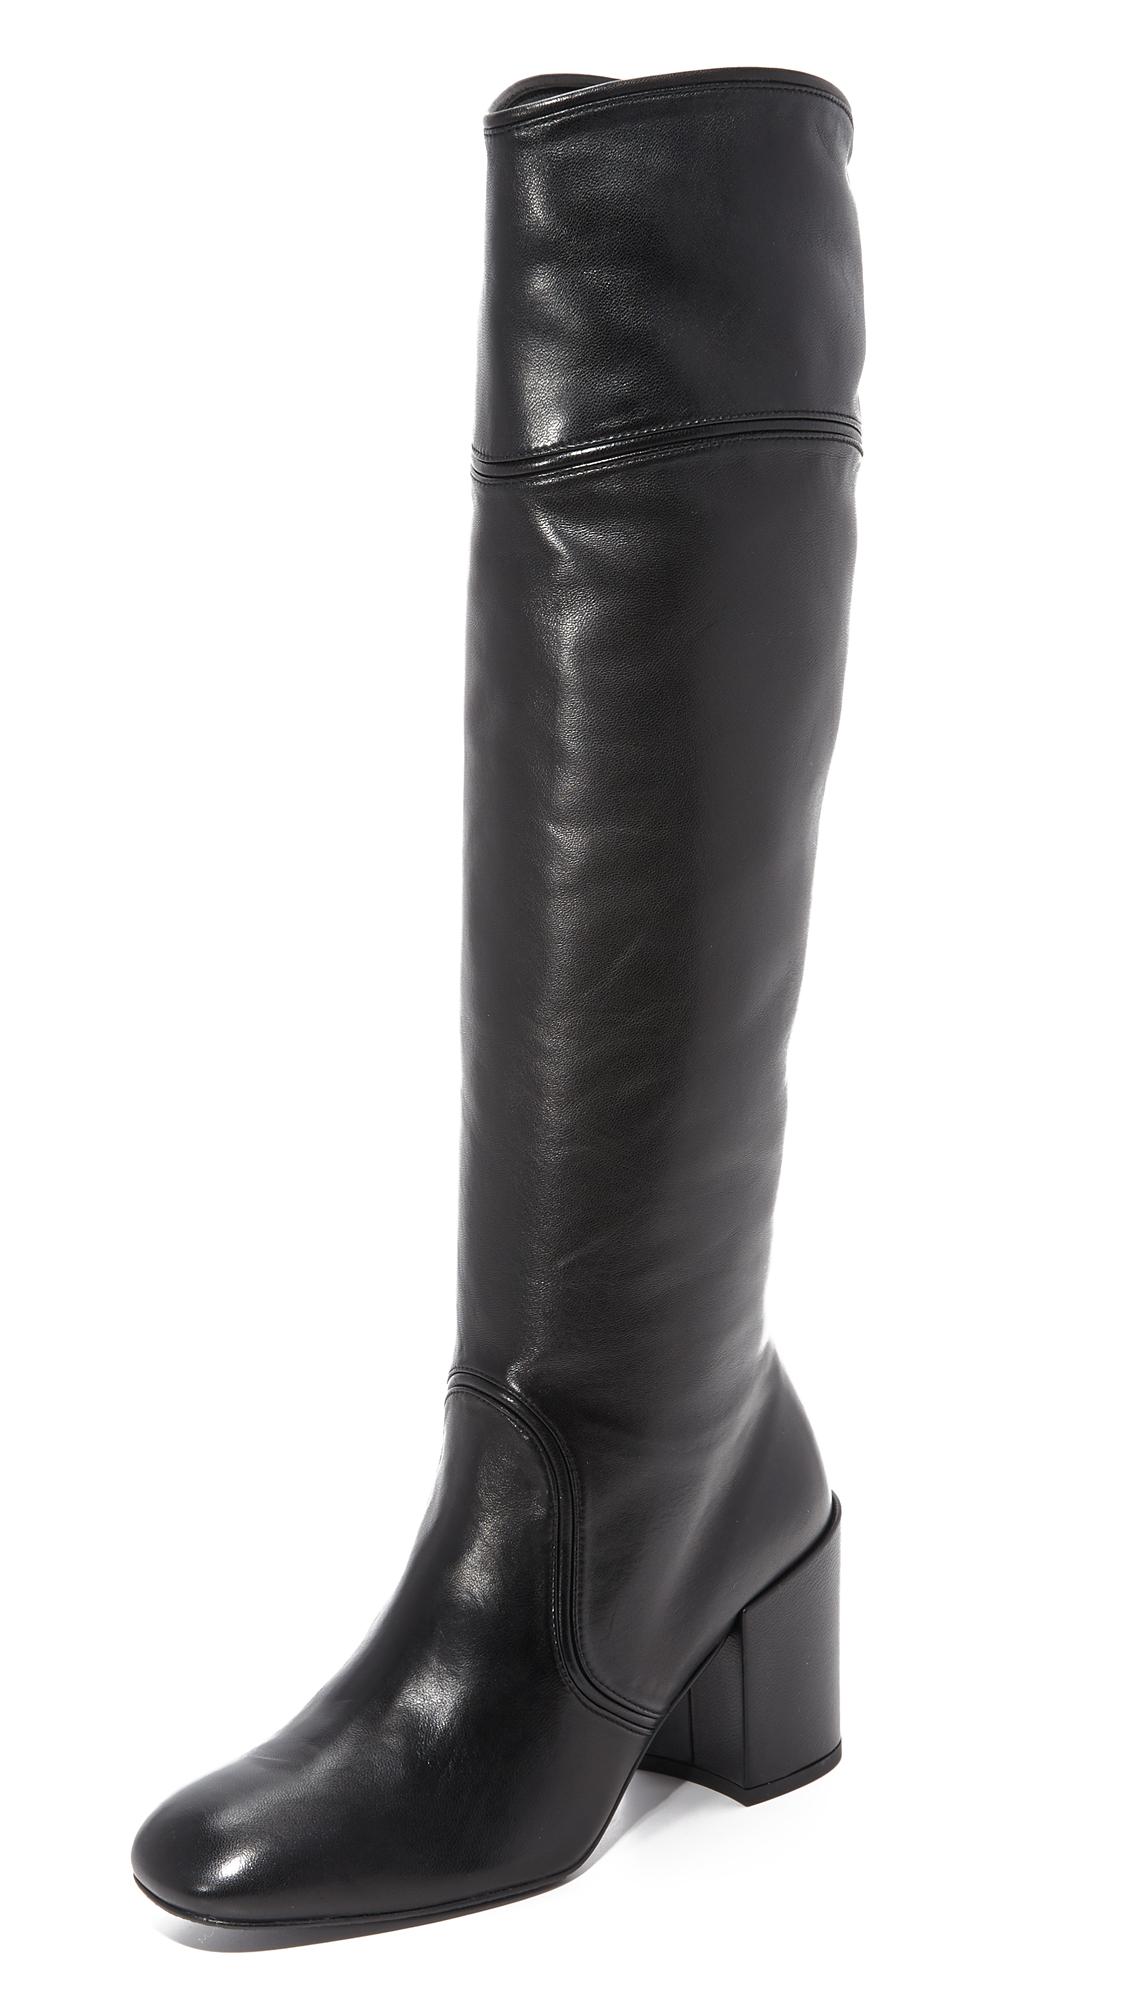 Stuart Weitzman Tubetop Boots - Black